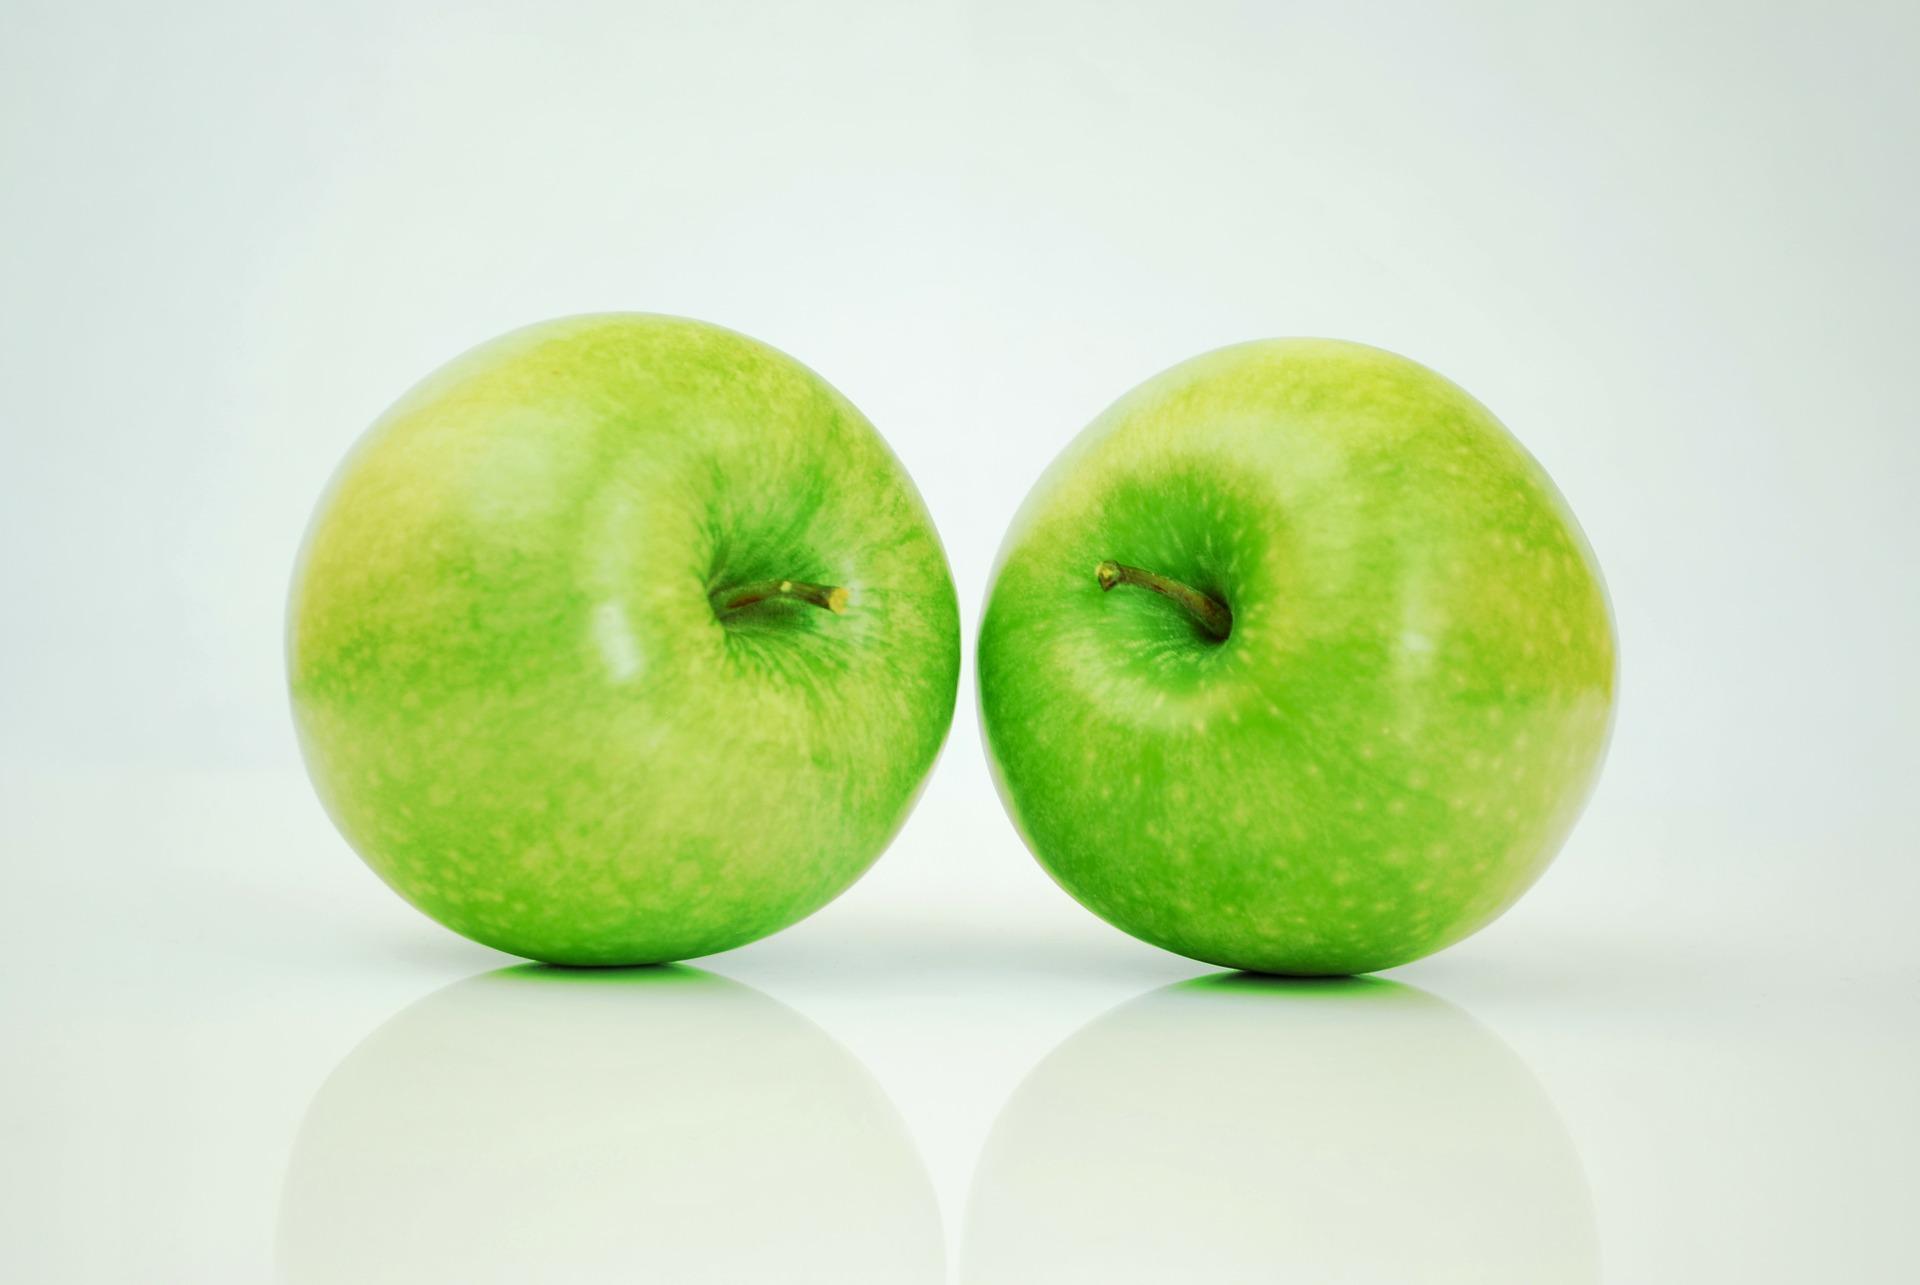 green apples Pixabay